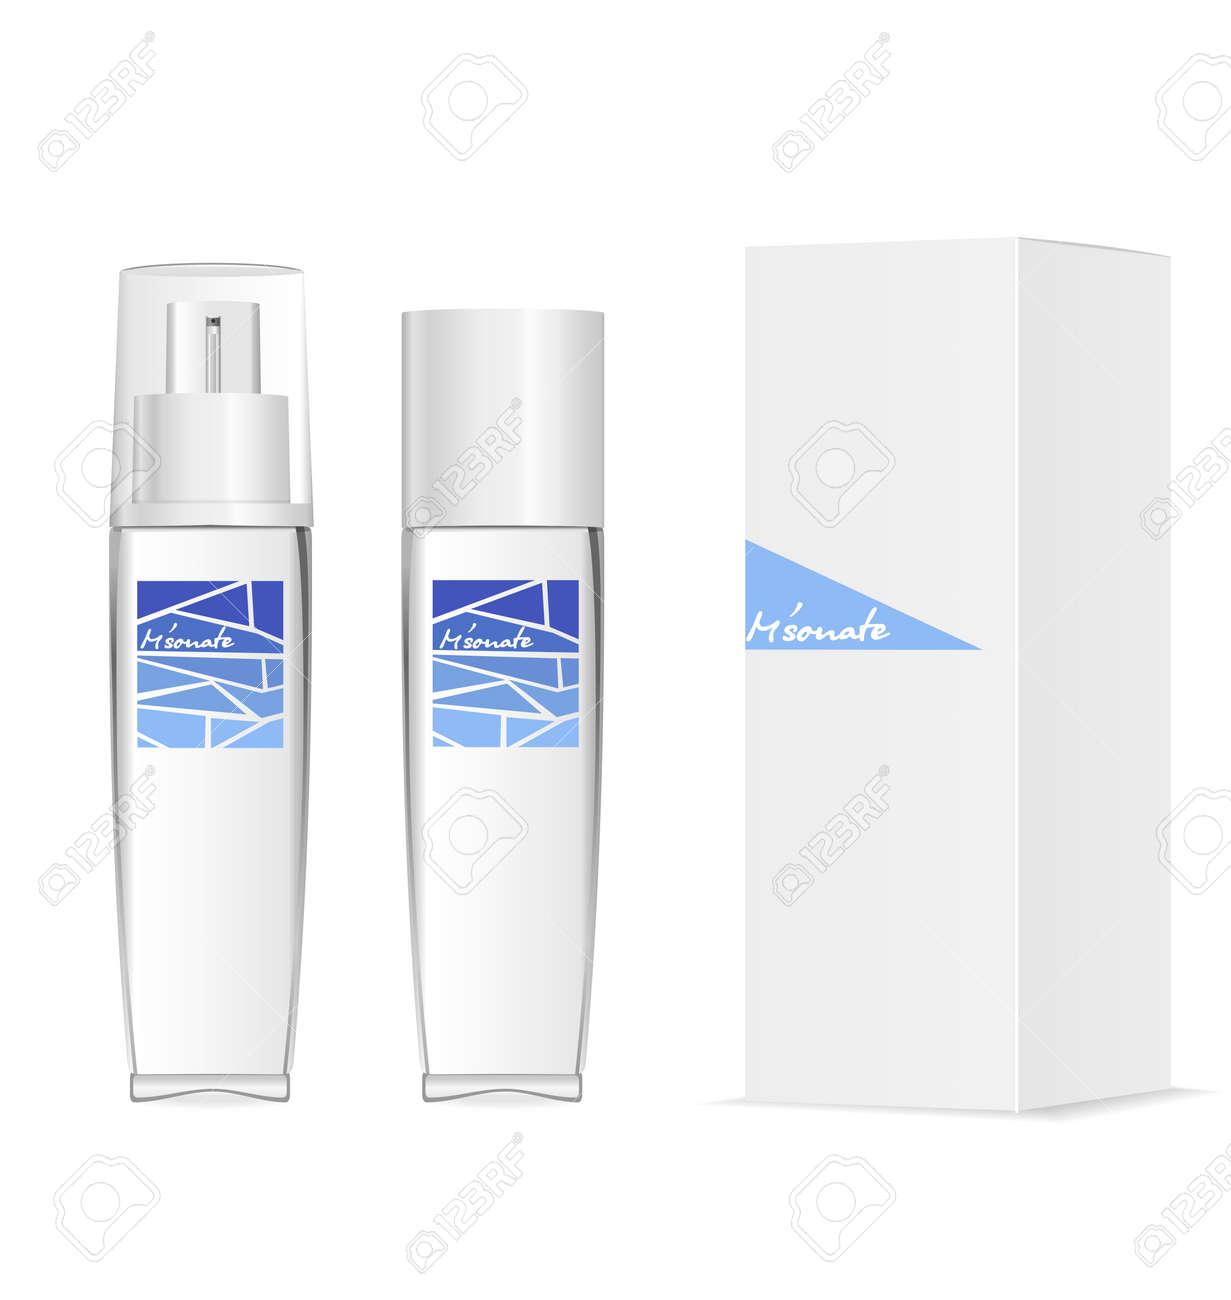 Glass or acylic bottles for parfum, moisturizer etc. - 158488956